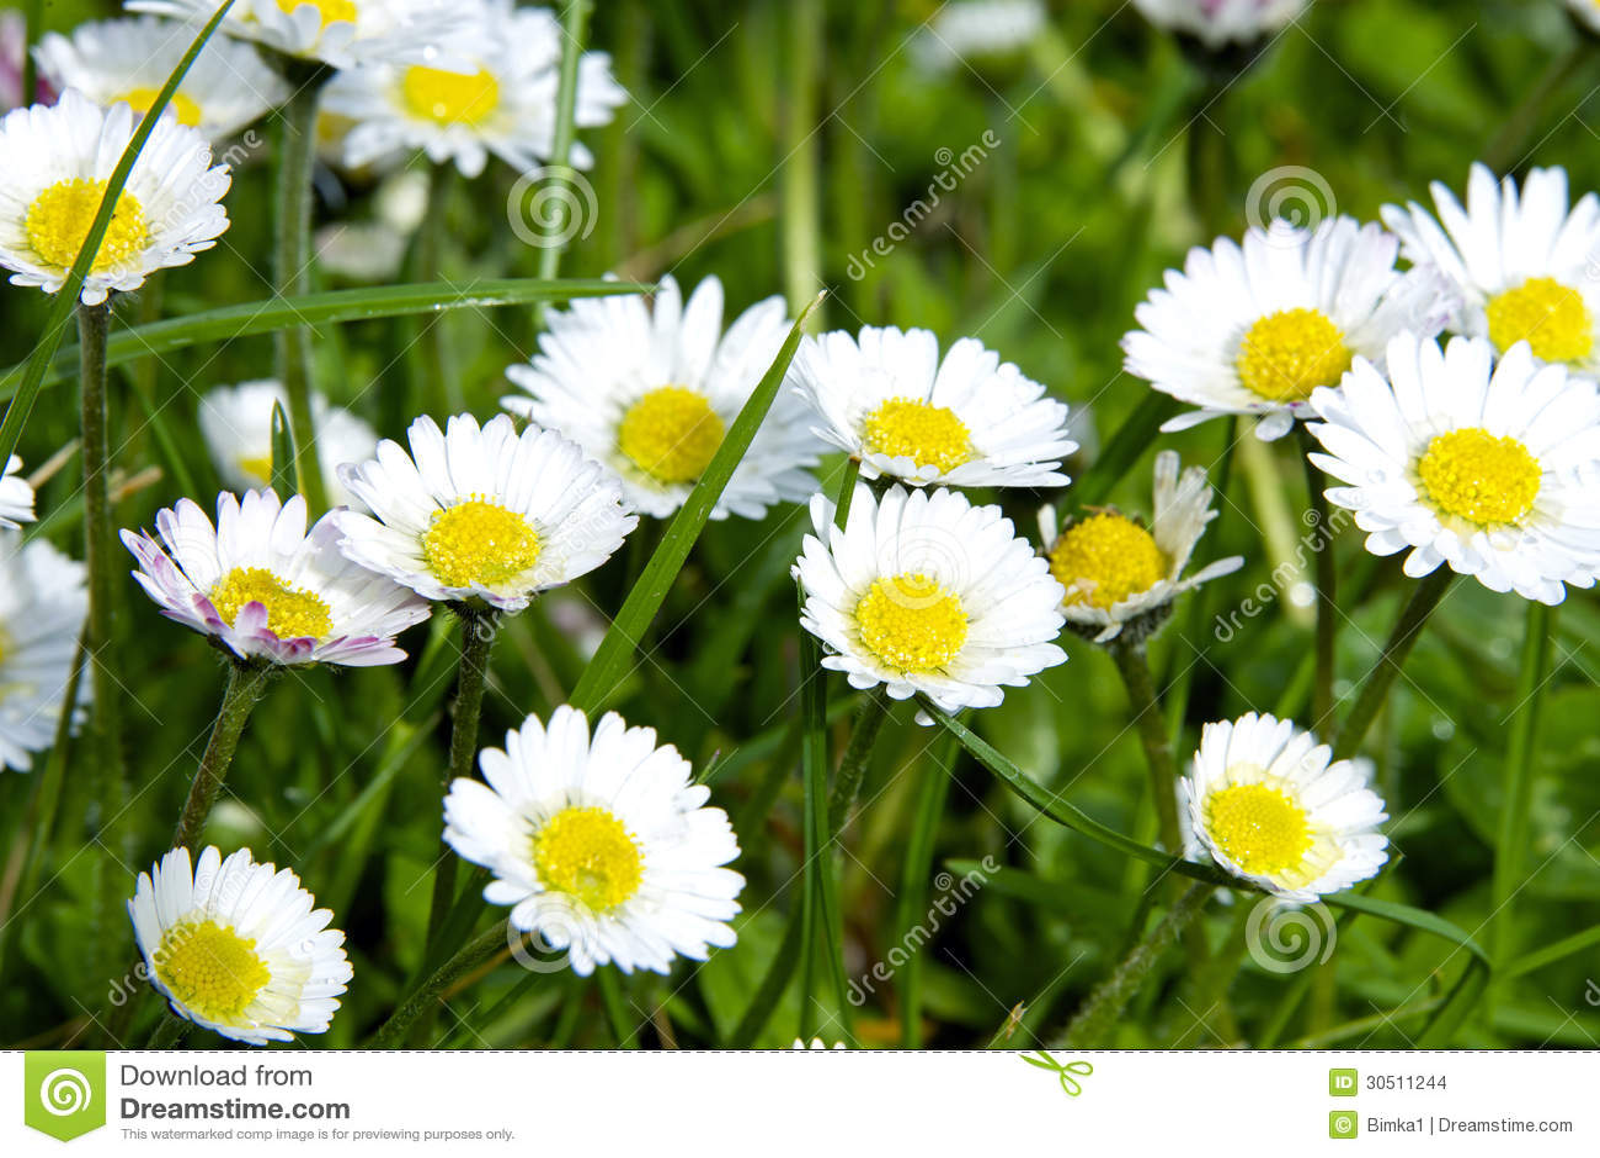 Green Grass Wild Daisy Flowers Stock Photo Image Of Nobody Petal